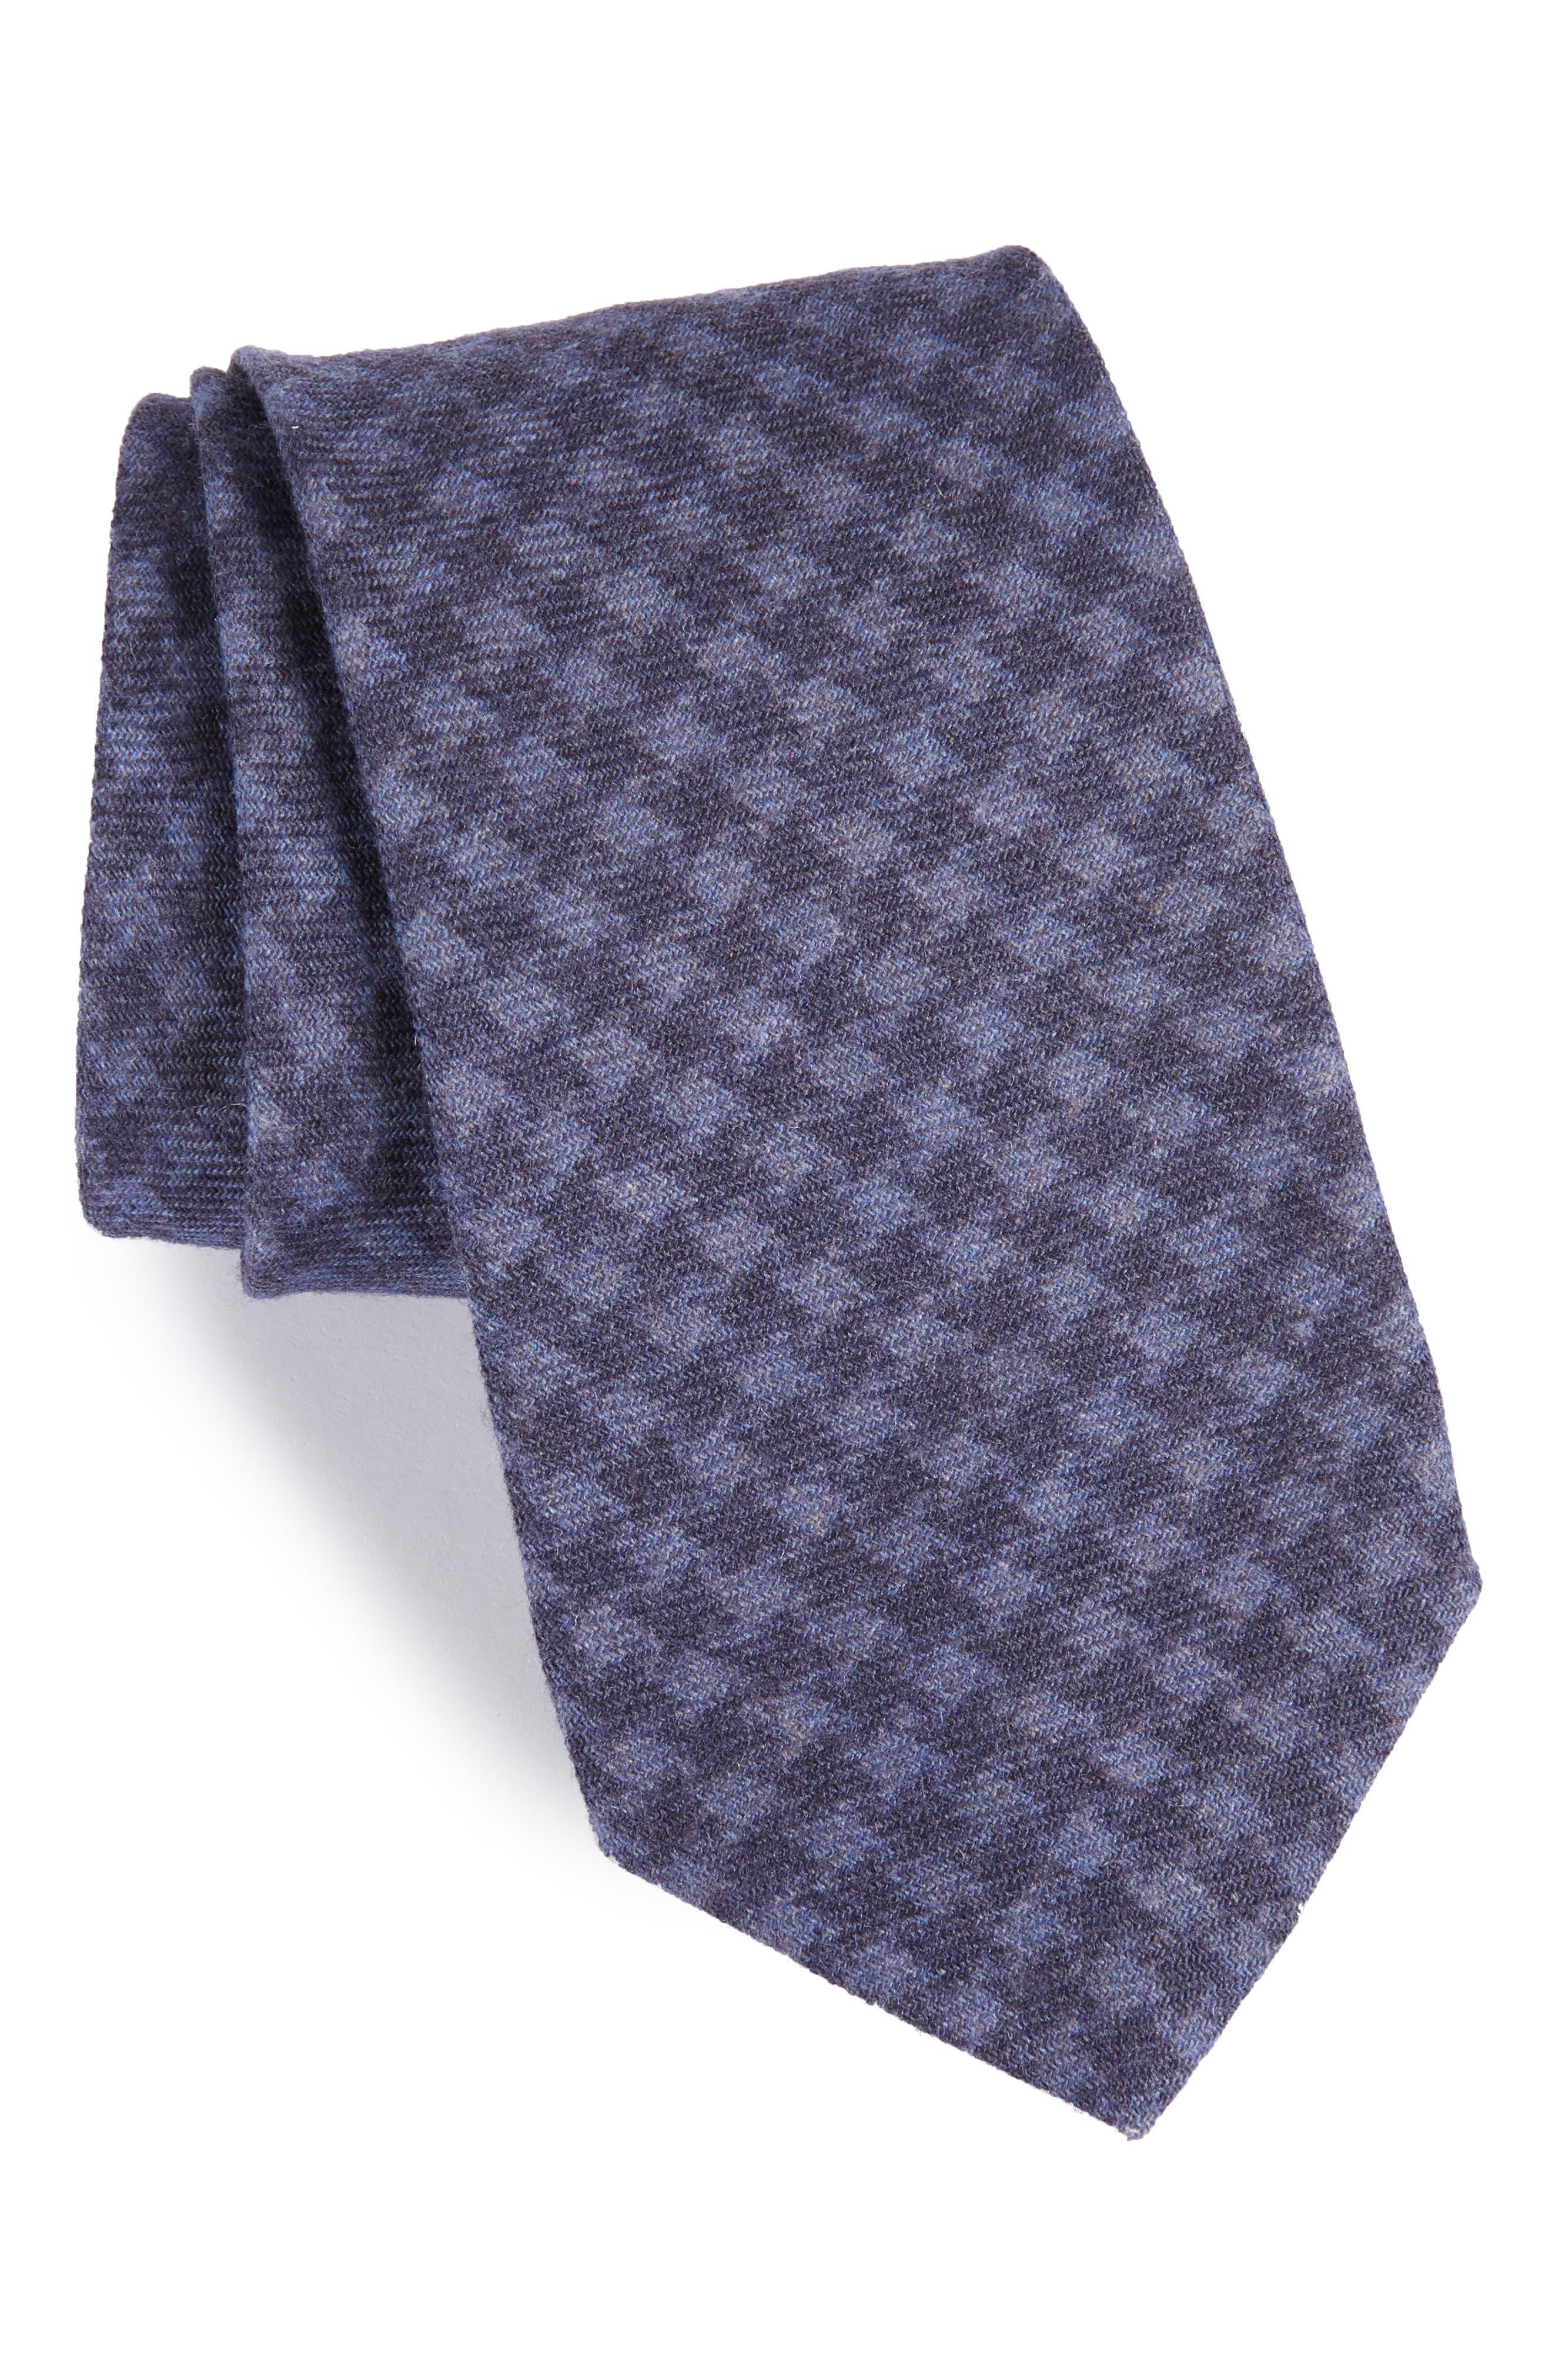 MICHAEL BASTIAN Houndstooth Wool Tie